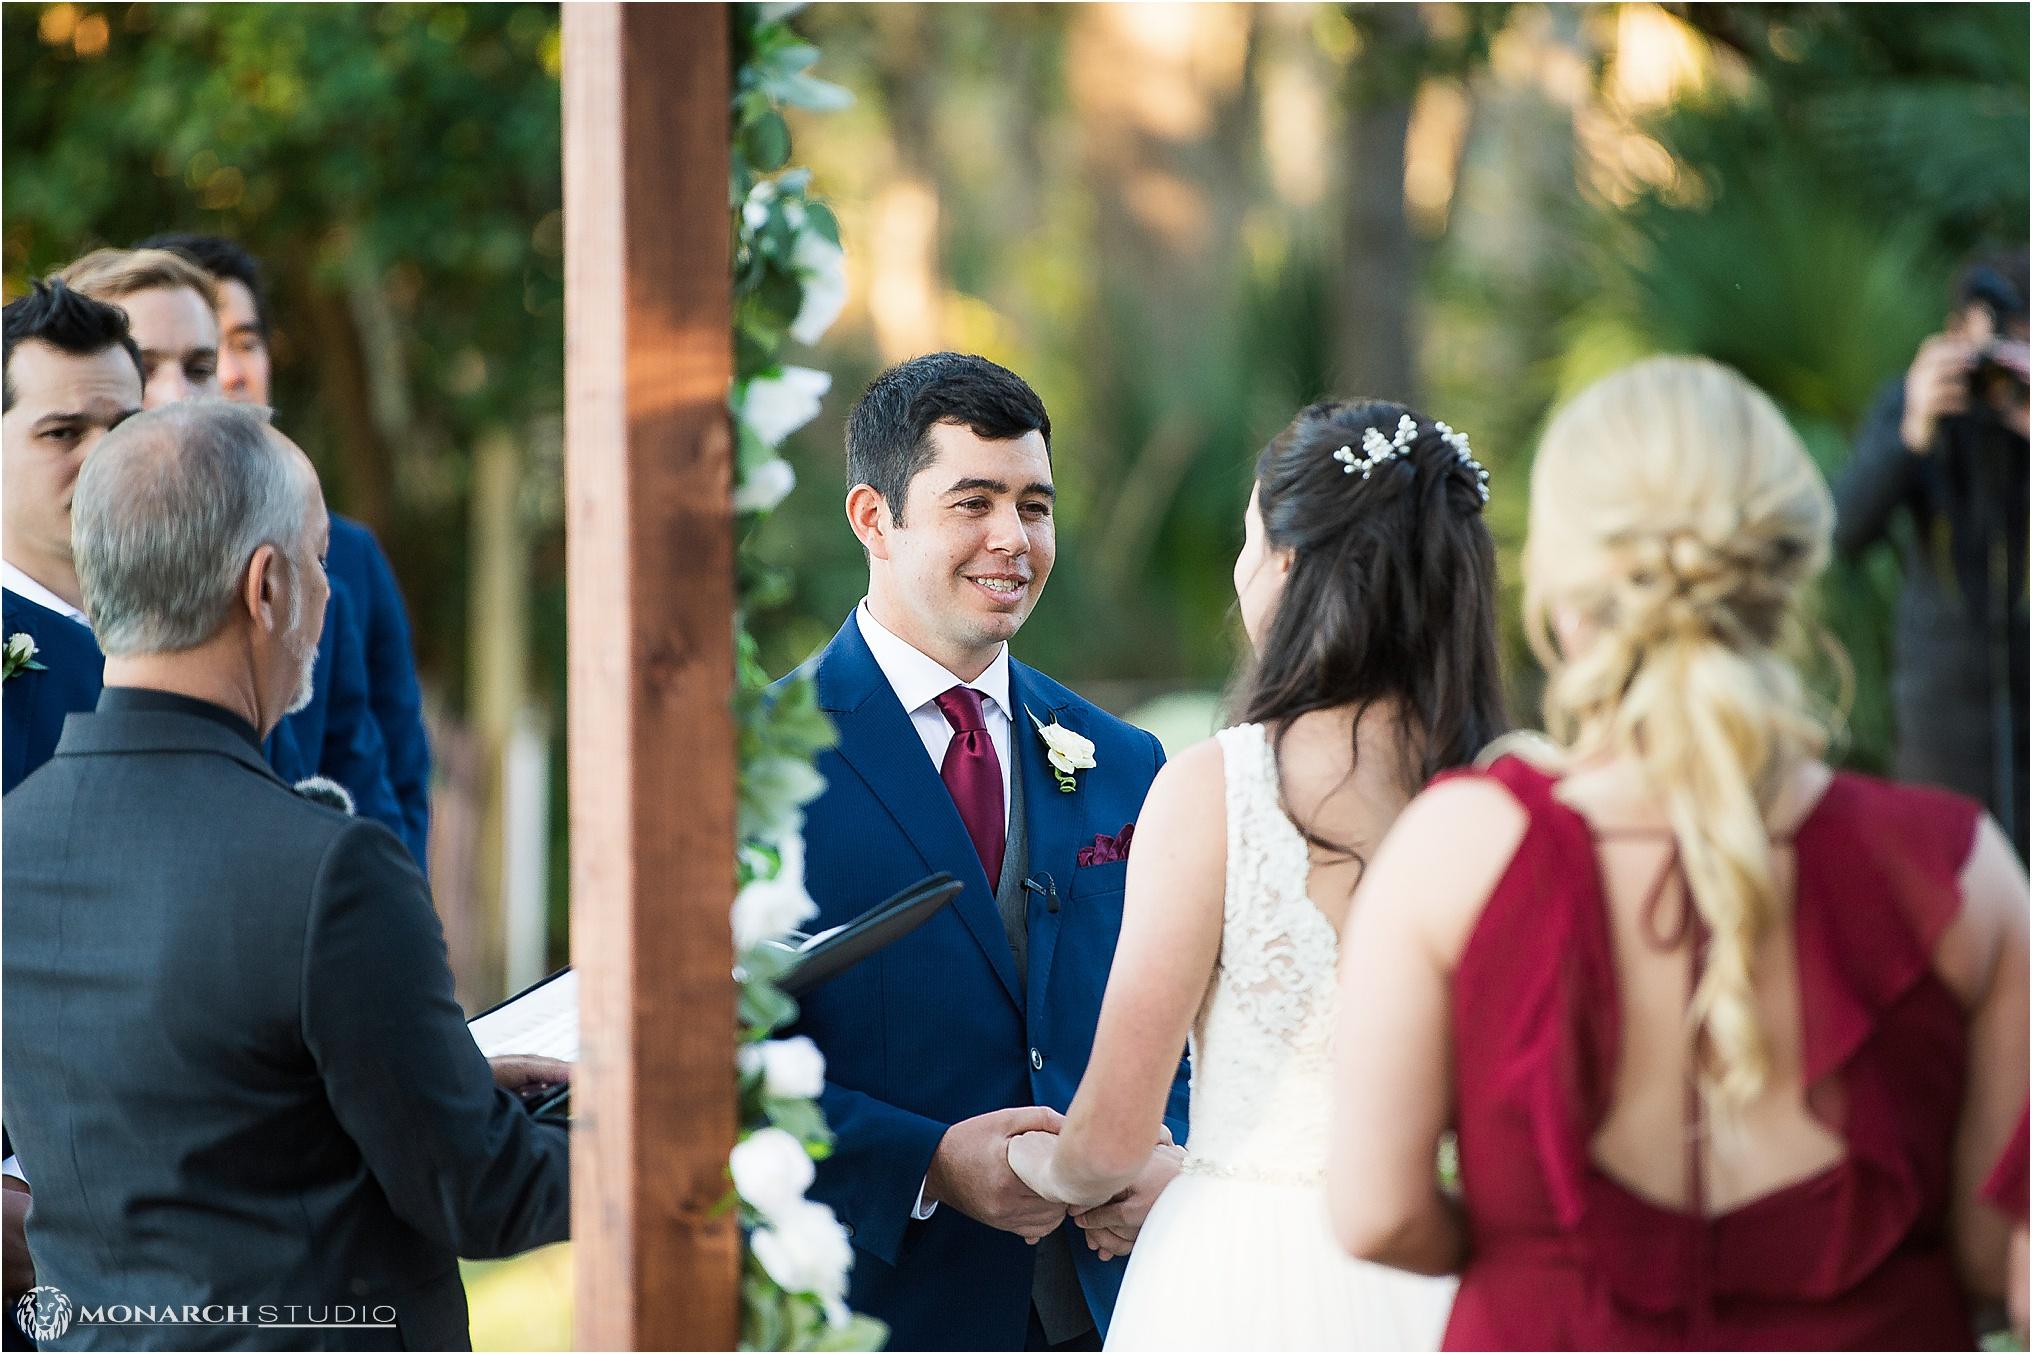 Wedding-photographer-in-sanford-florida-natural-wedding-054.jpg